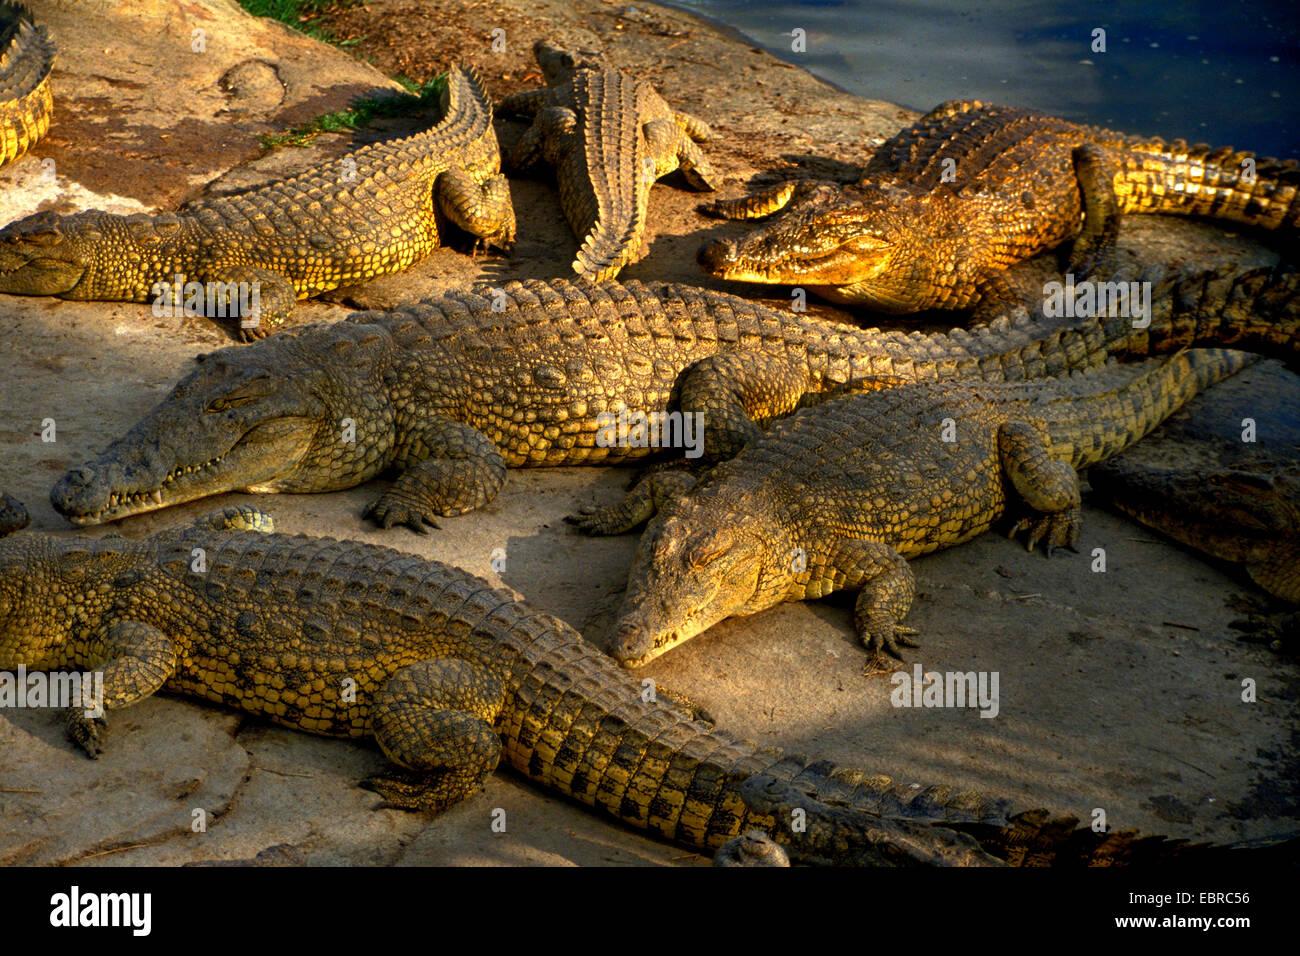 Nil-Krokodil (Crocodylus Niloticus), mehrere Nil-Krokodile am Ufer, Côte d ' Ivoire, Yamoussoukro Stockbild